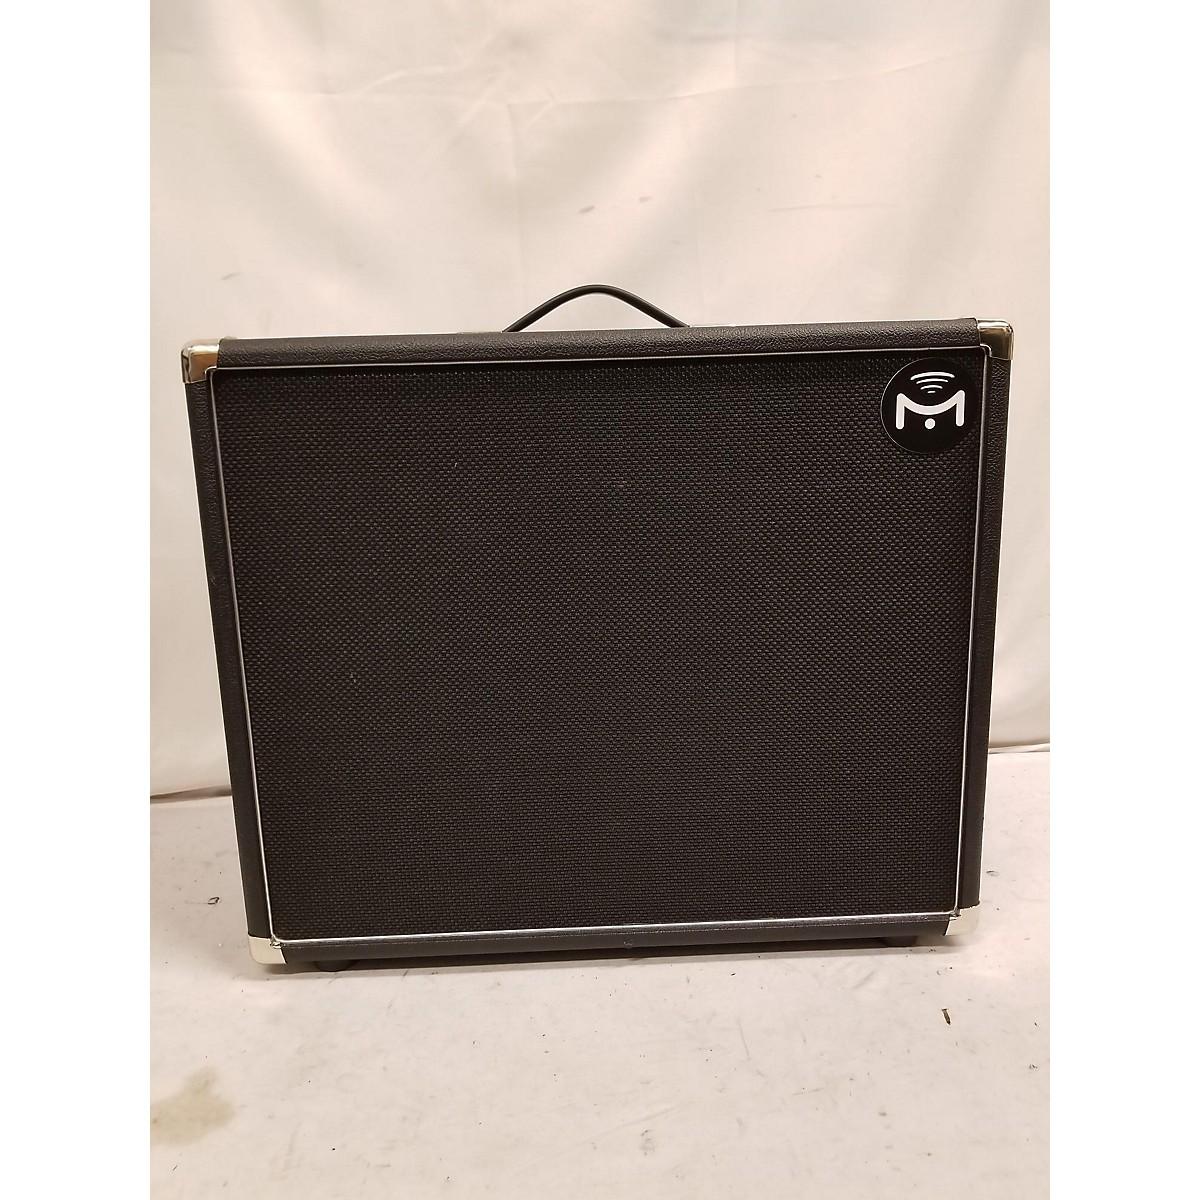 Mission Engineering 2016 GEMINI 1-BT Guitar Combo Amp